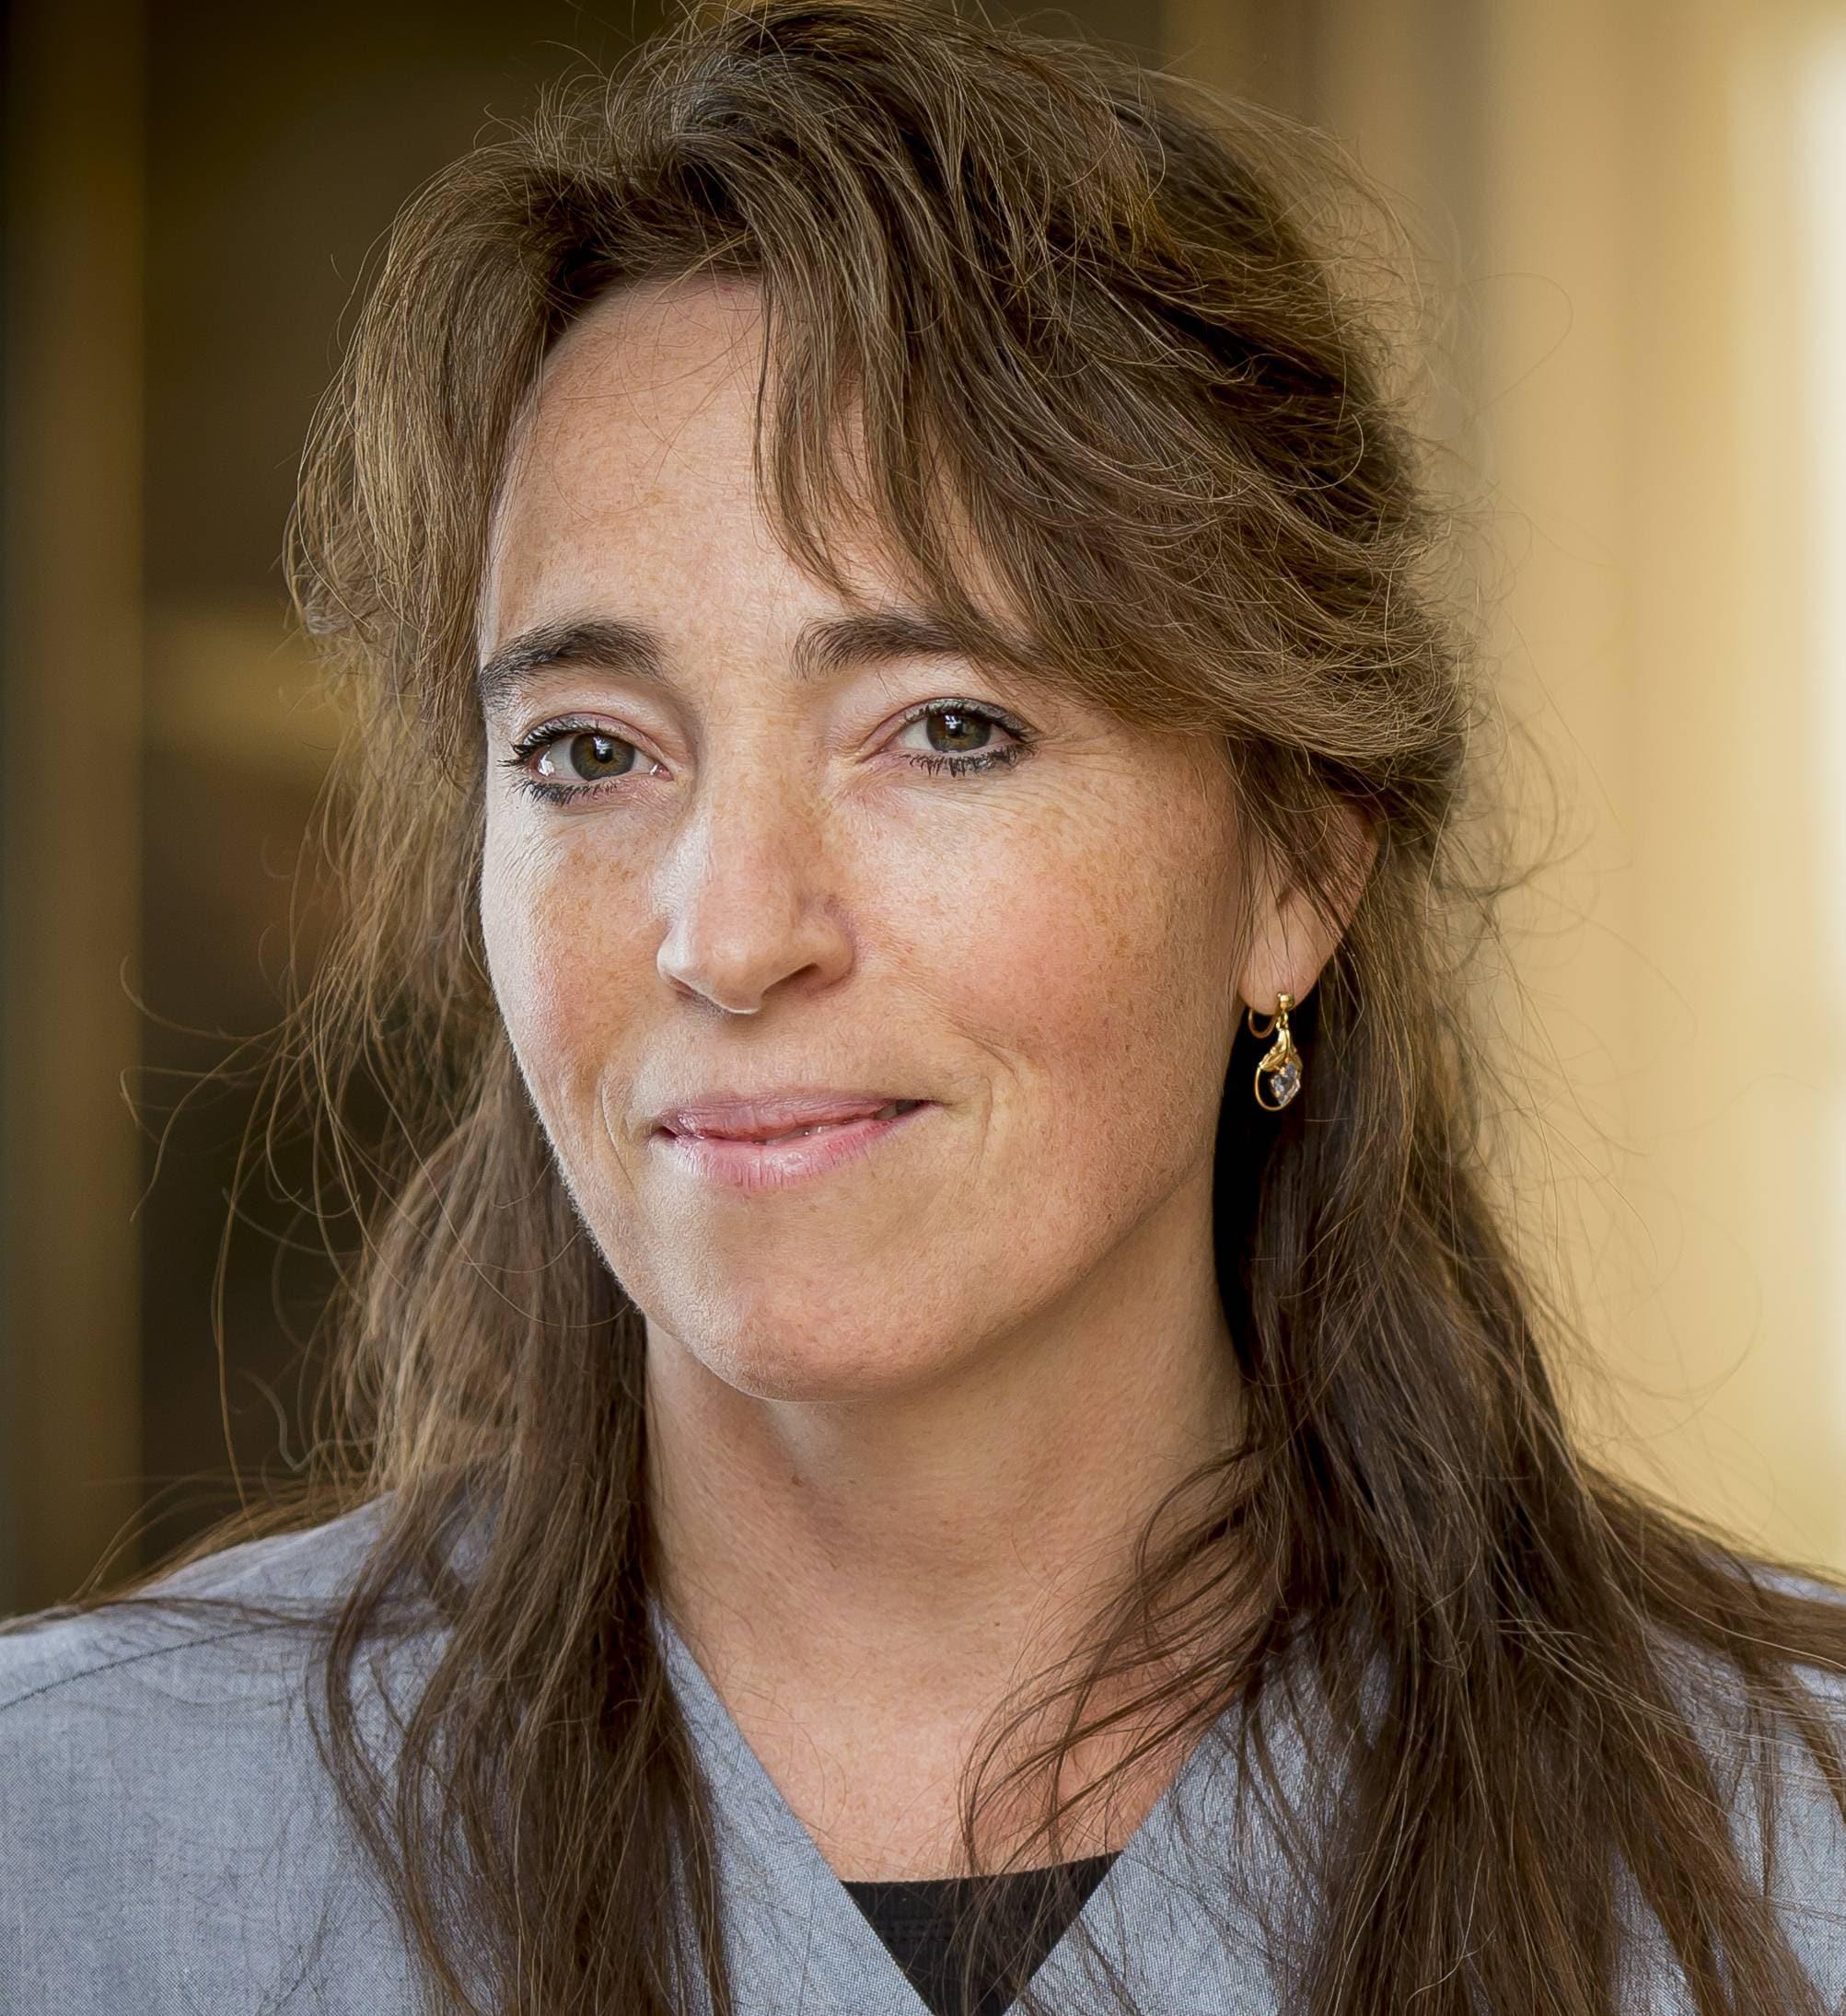 Sophia Ehrström